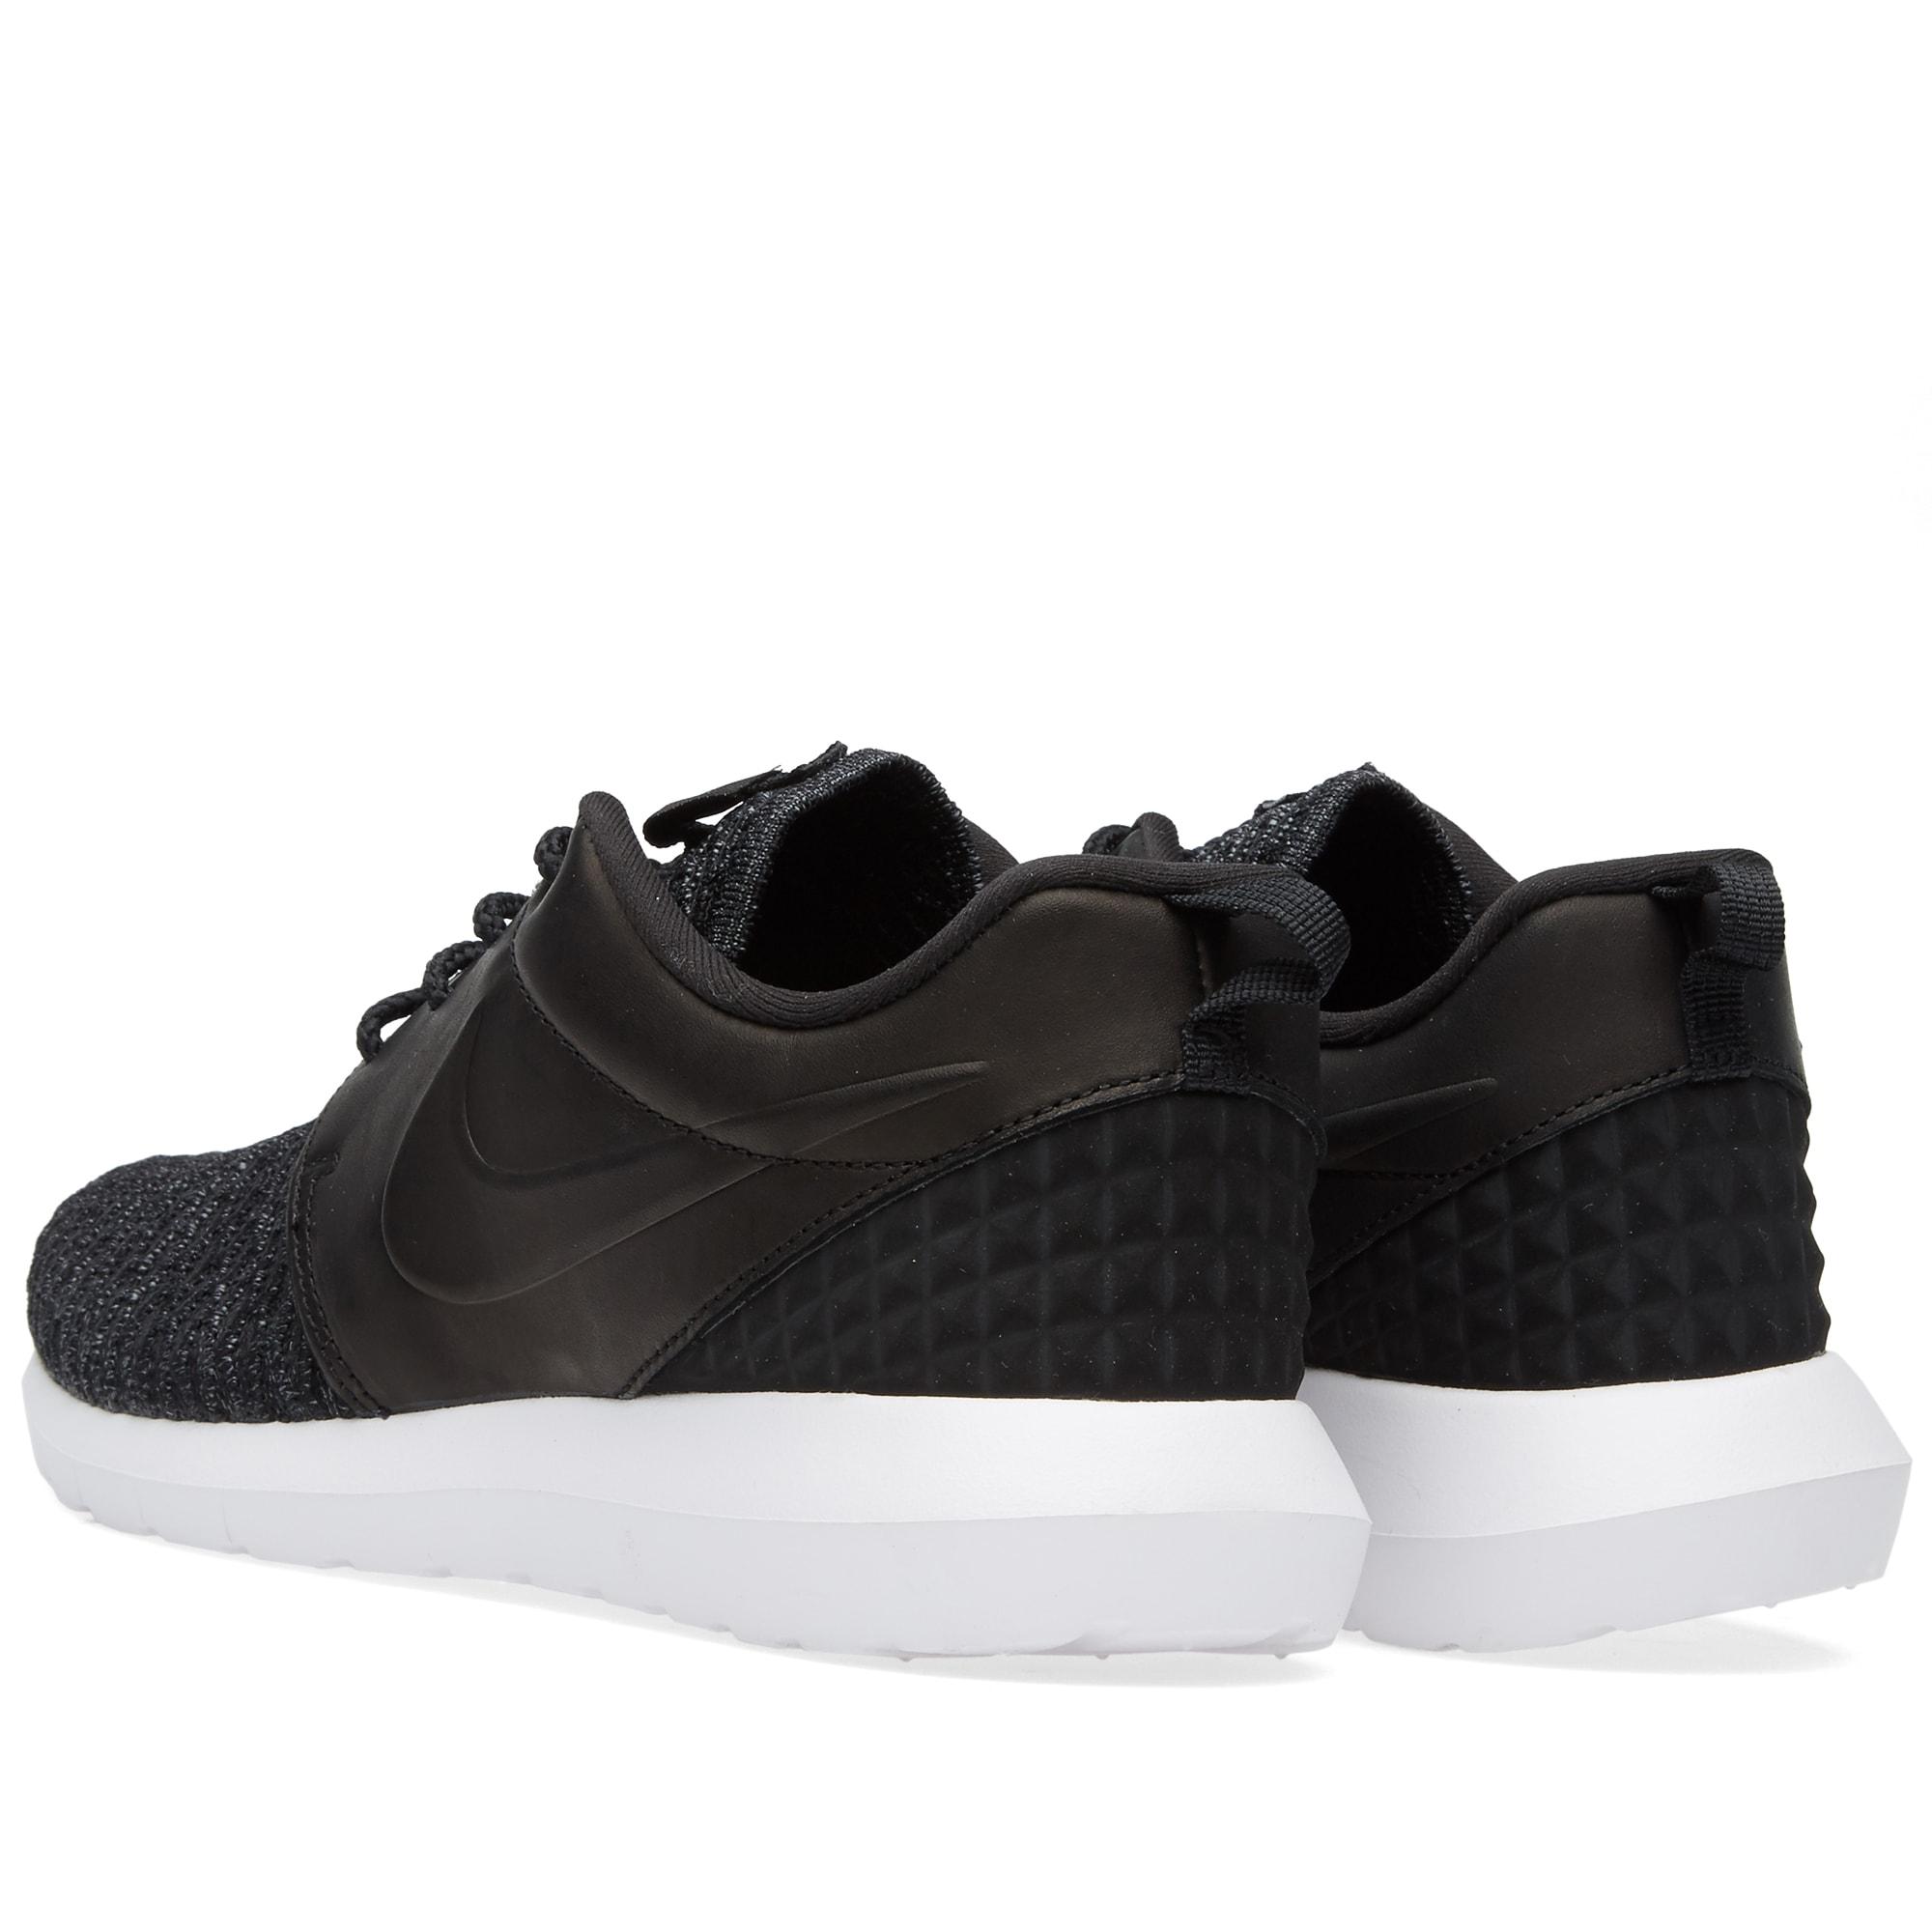 size 40 ba7f9 36cbe Nike Roshe One NM Flyknit Premium Black, Dark Grey   White   END.